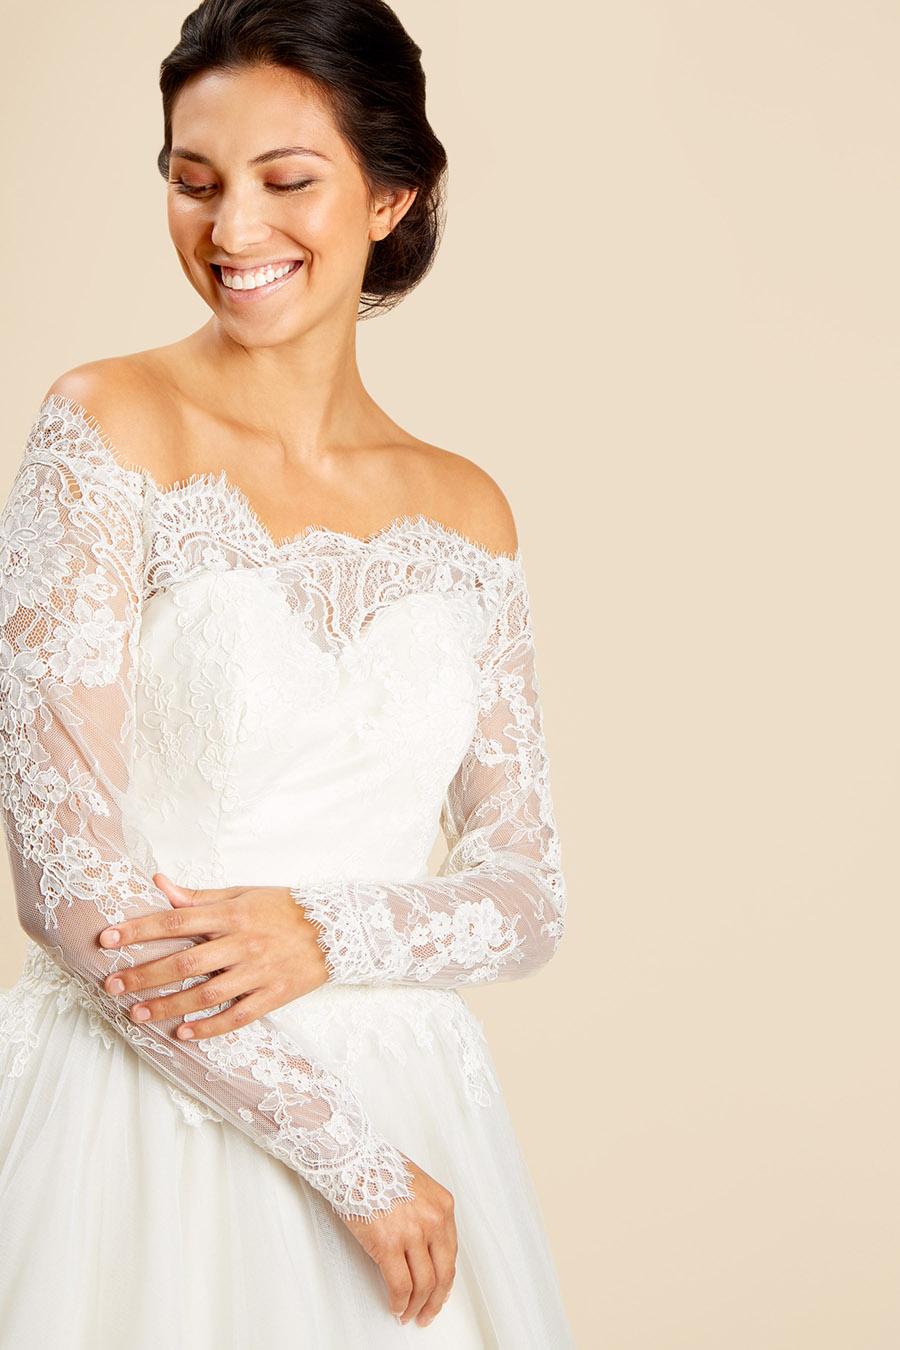 preloved wedding dresses charity wedding dress Brides Do Good UK (10)